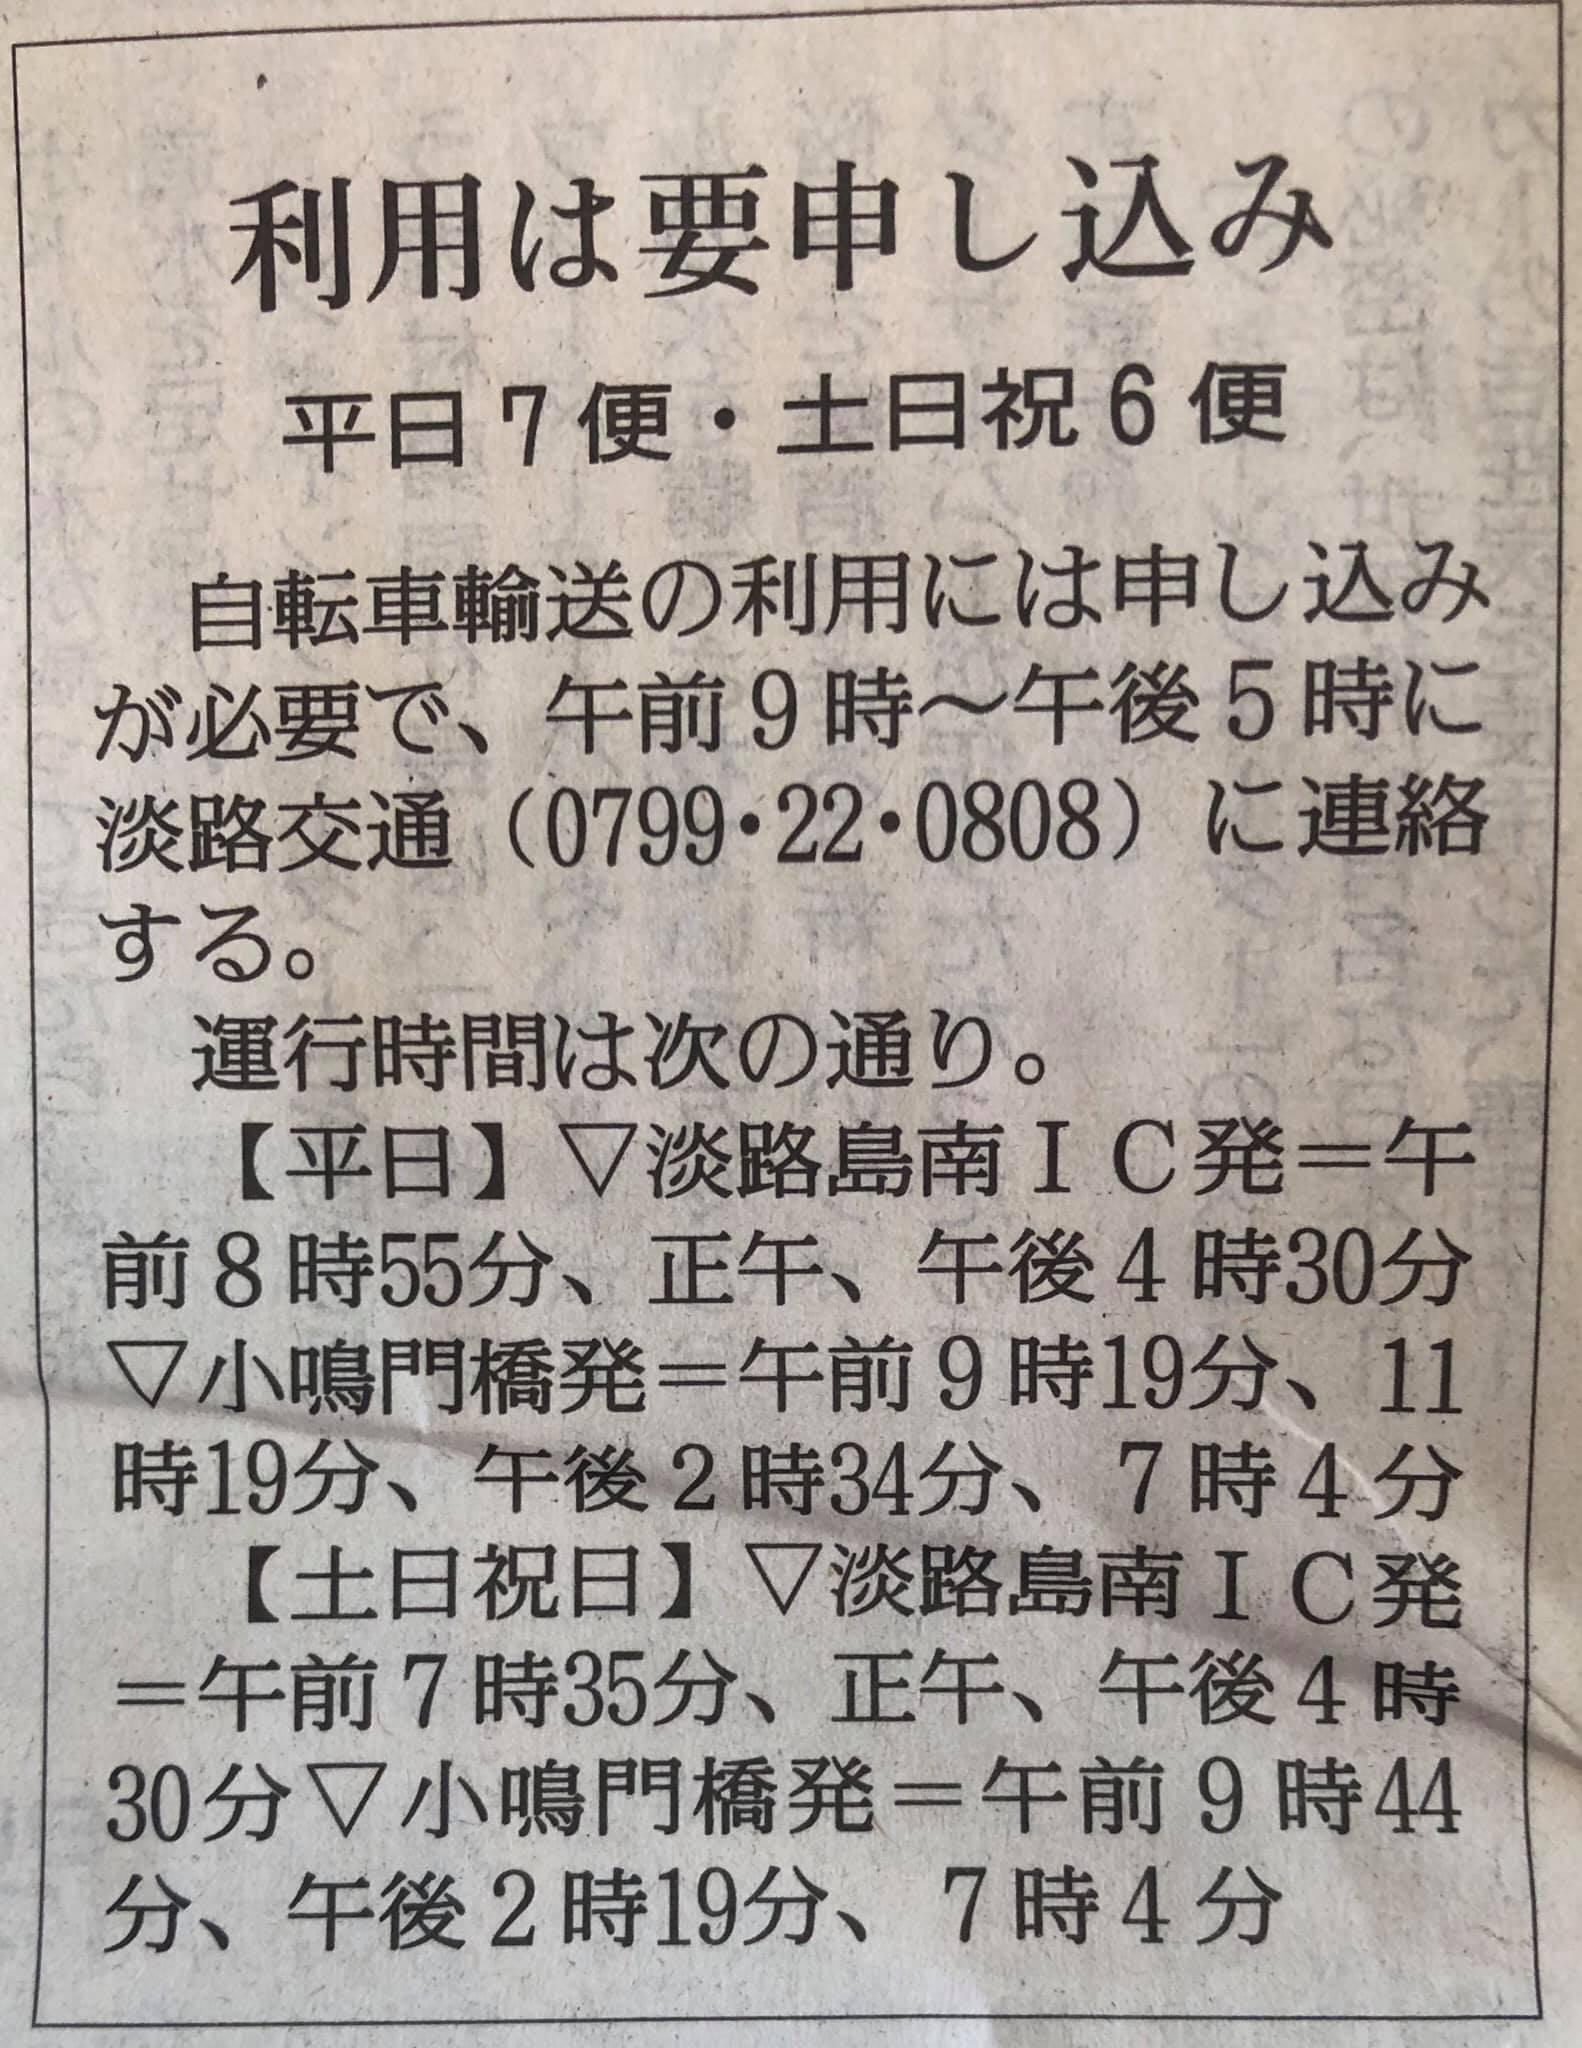 <<How to transfer to Shikoku Island with your bike, recent solution etc..>>_f0365484_11210648.jpg